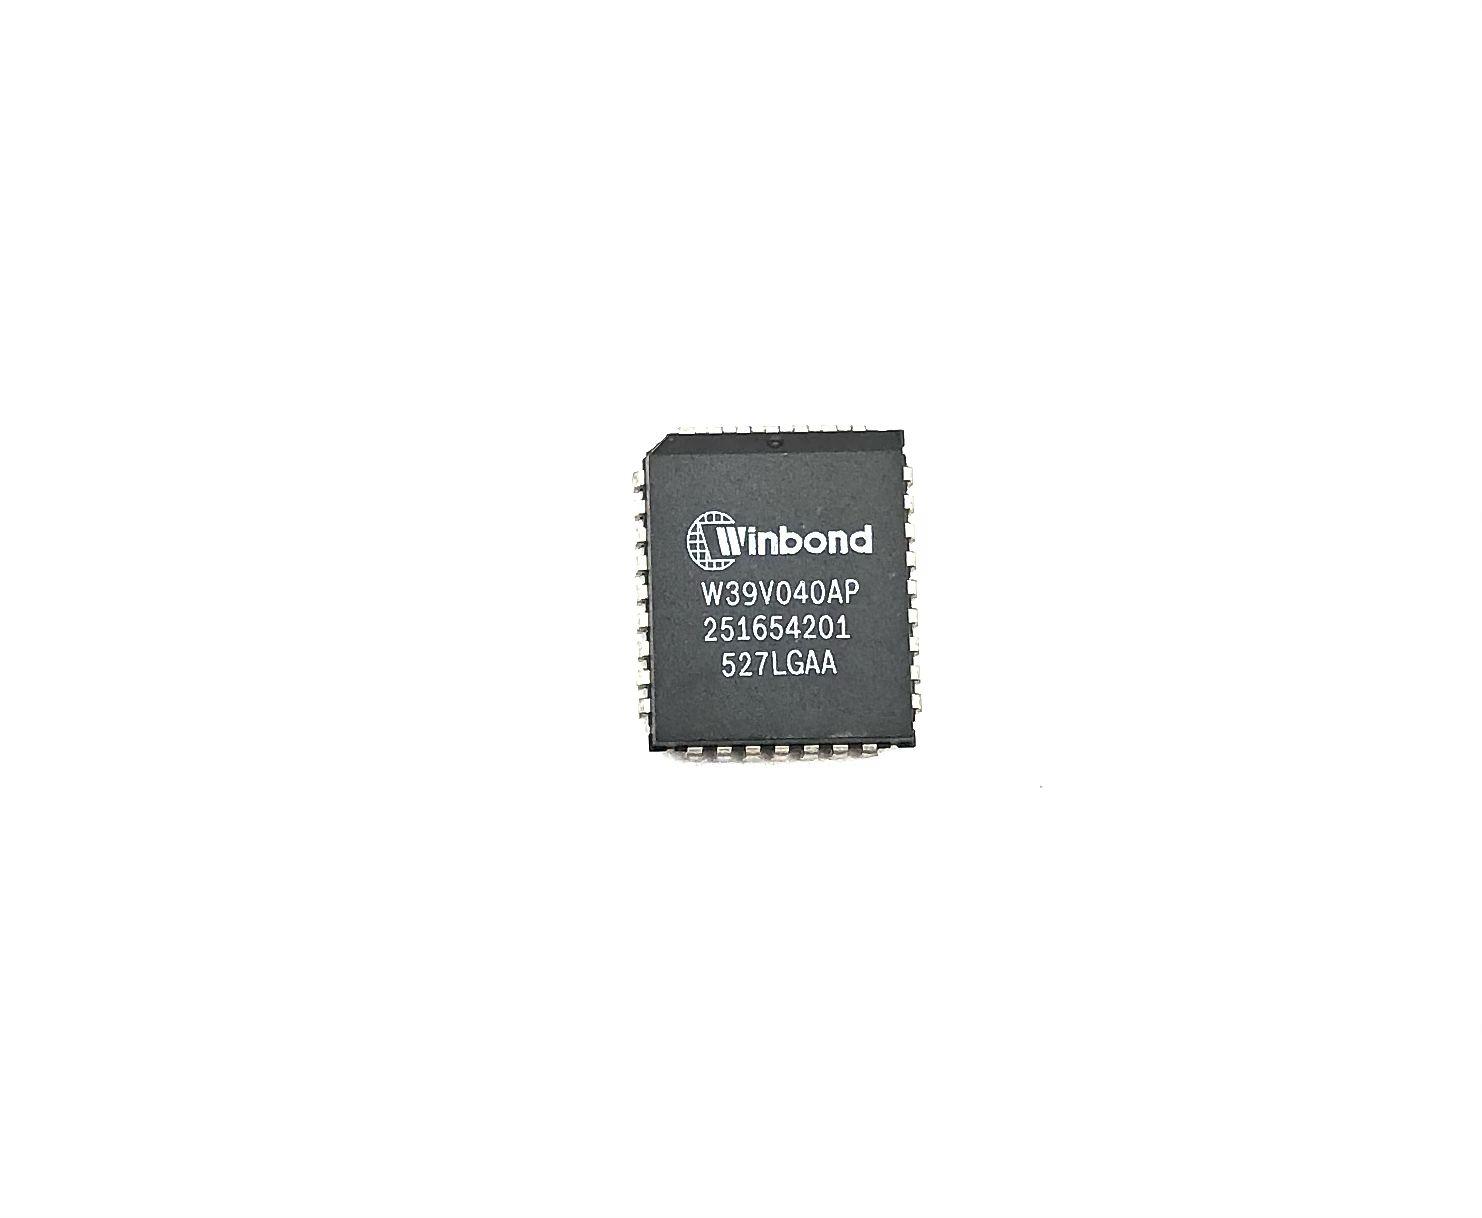 CIRCUITO INTEGRADO SMD PLCC 36 PINOS W39V040AP WINBOND